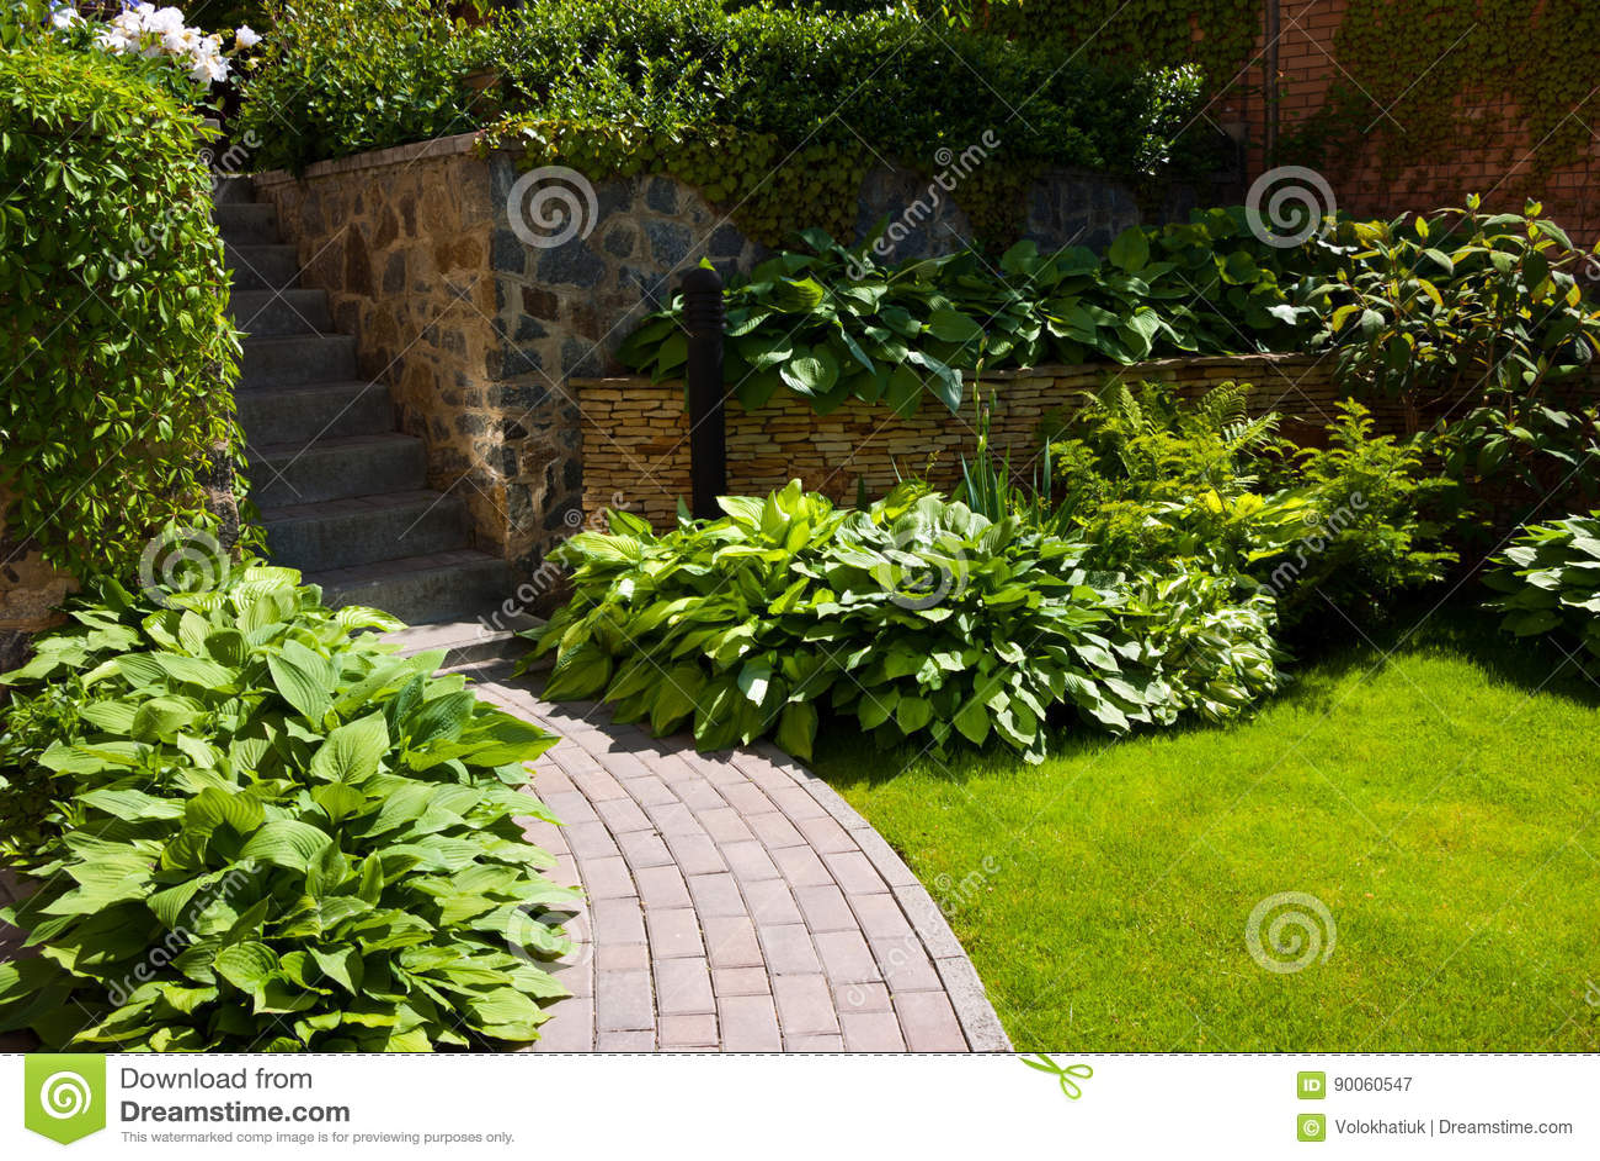 Tuinweg met gras